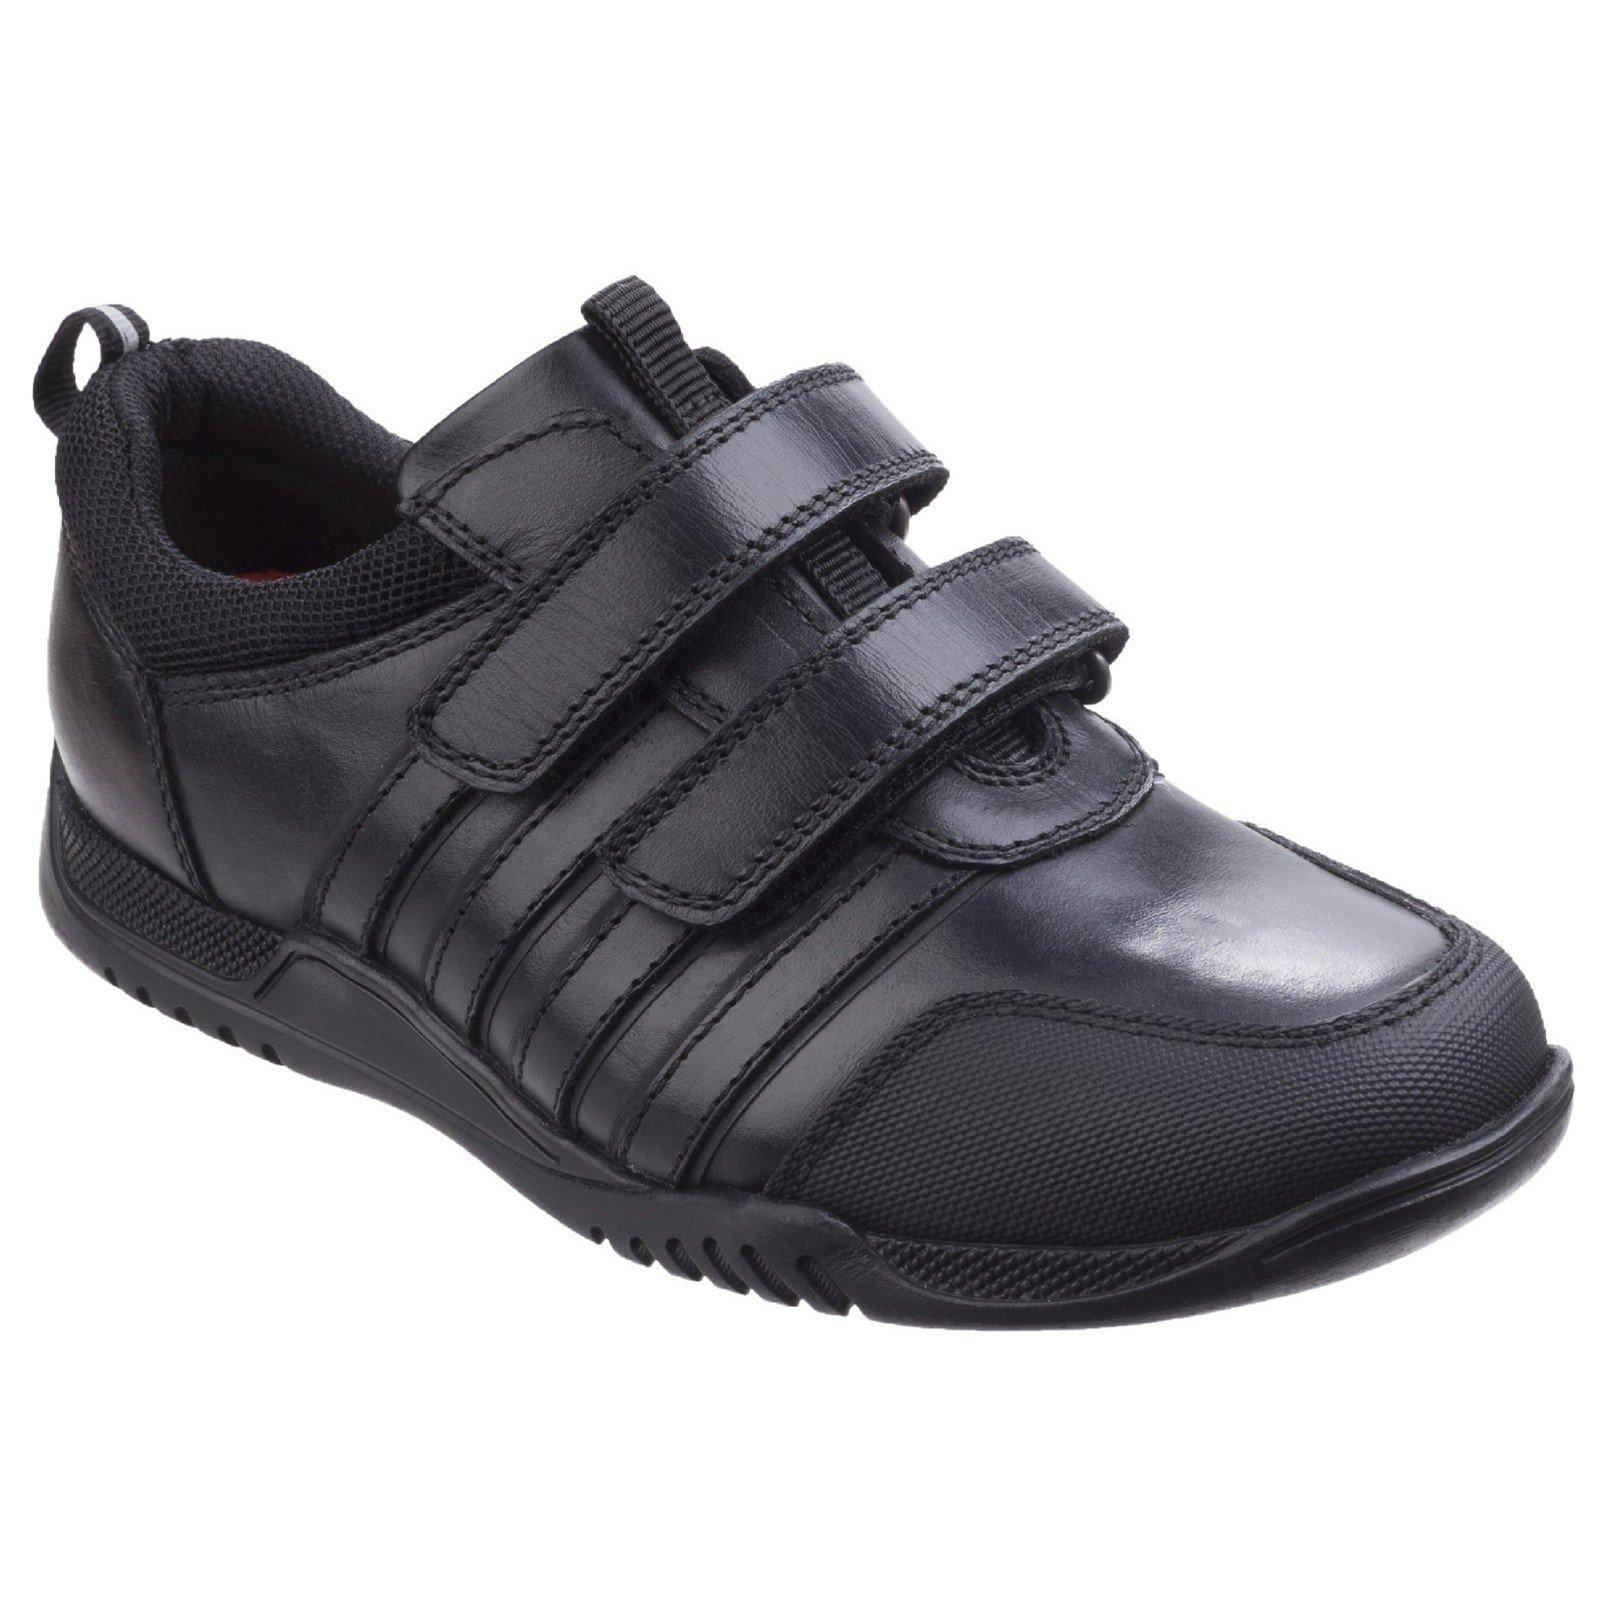 Hush Puppies Kid's Josh Senior School Shoe Black 26396 - Black 6.5